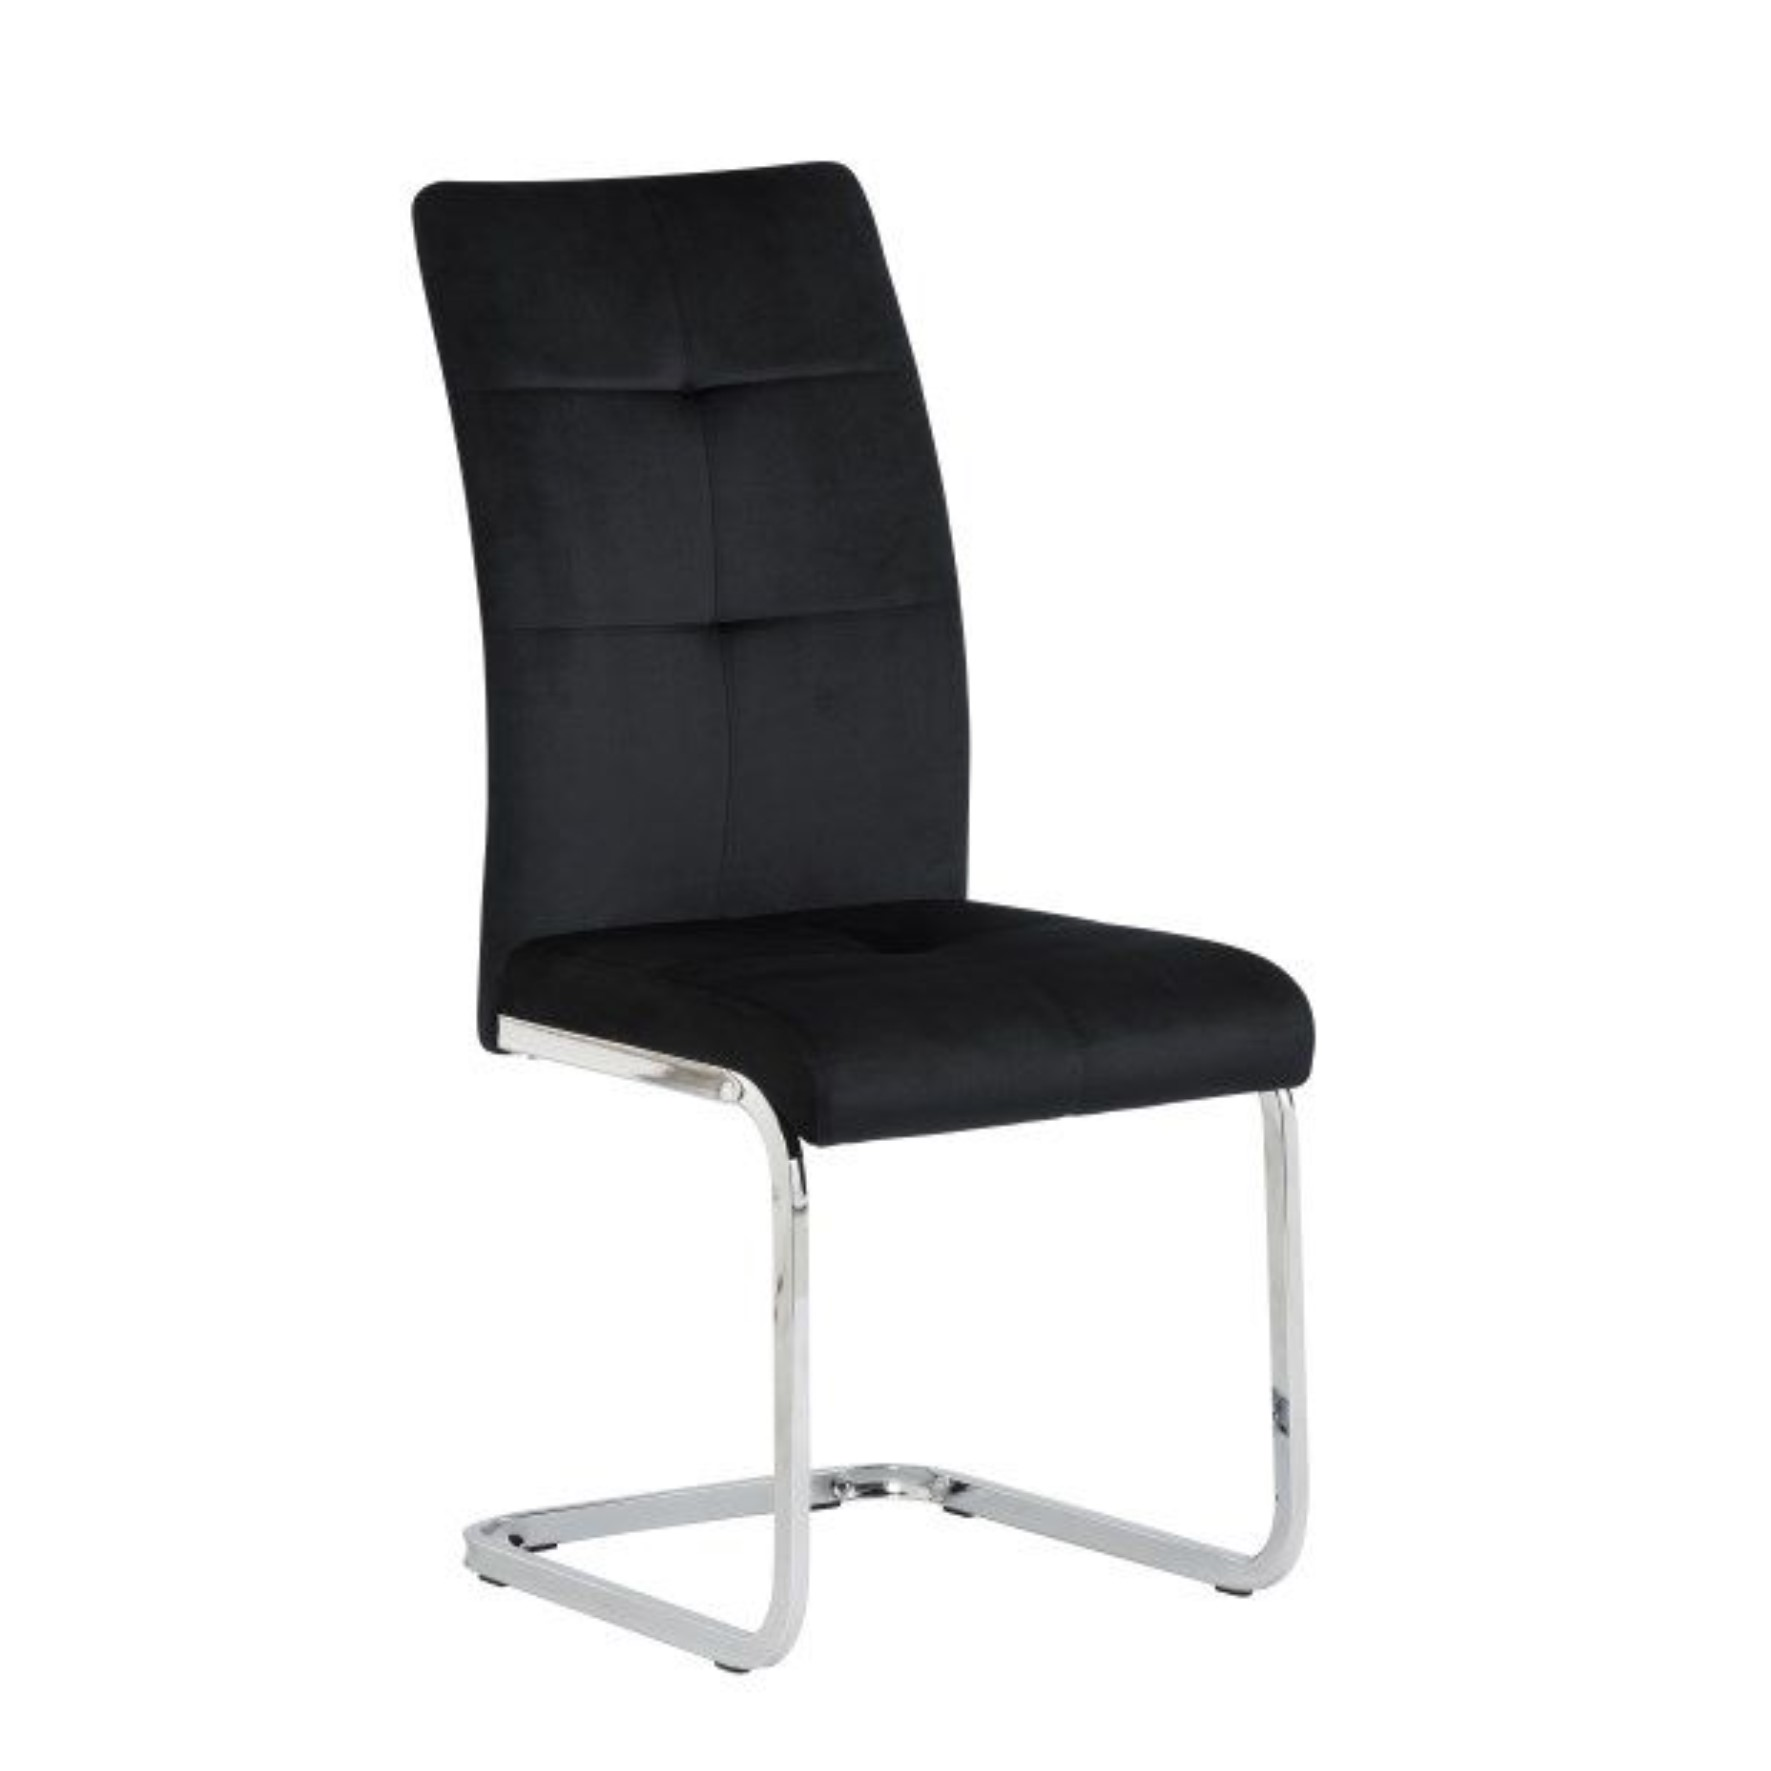 Florenzi Black Dining Chair